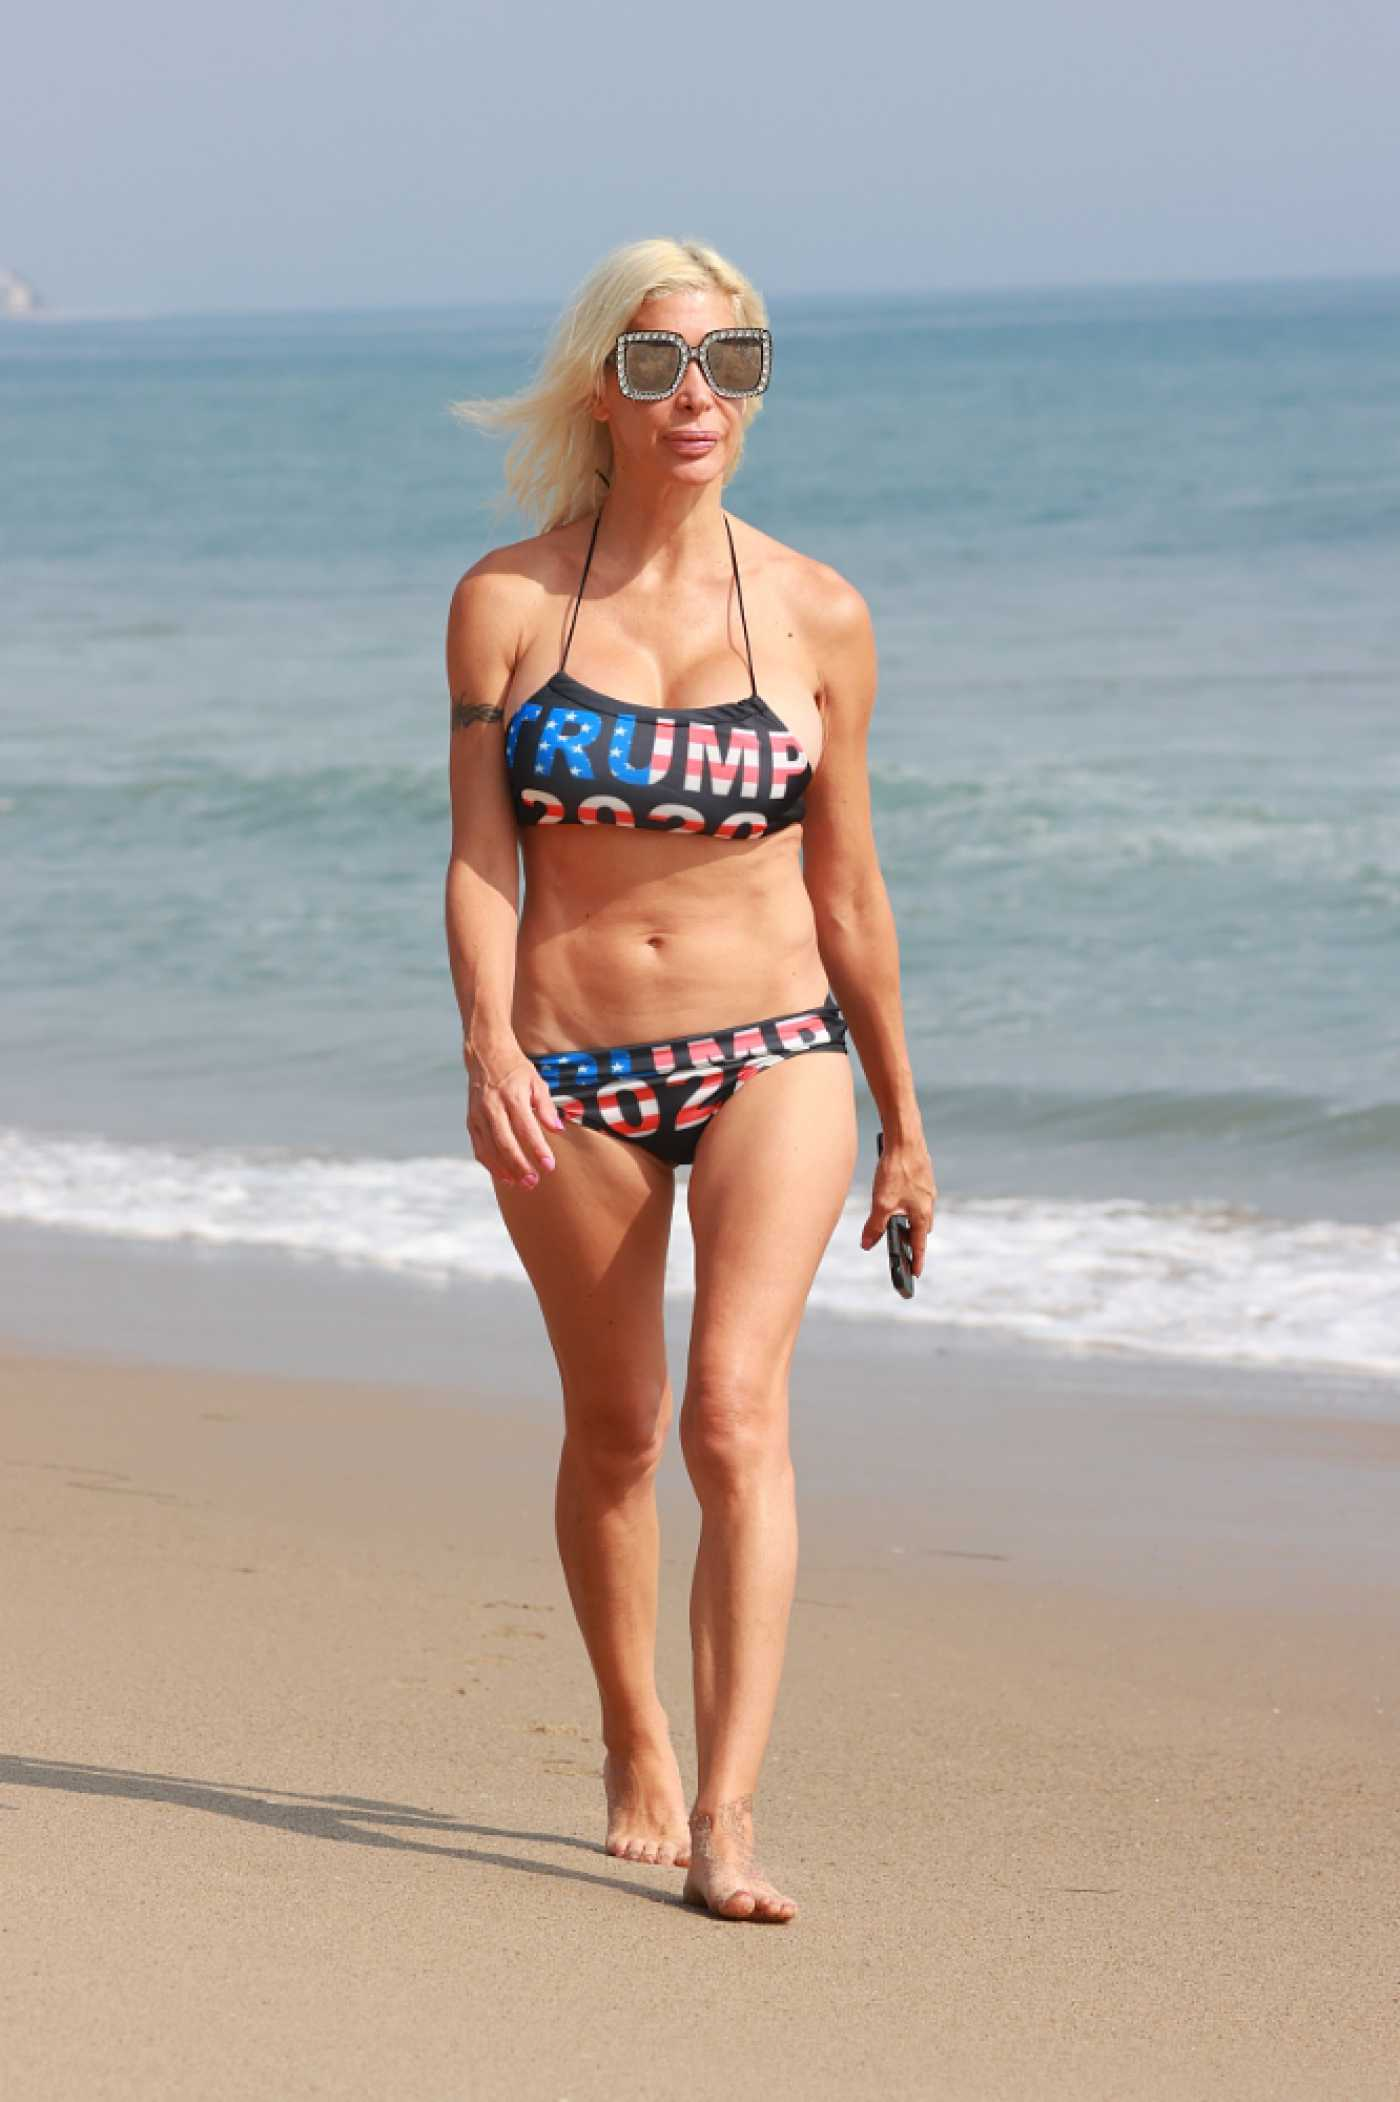 Angelique Morgan in a Trump 2020 Bikini on the Beach in Malibu 10/05/2020